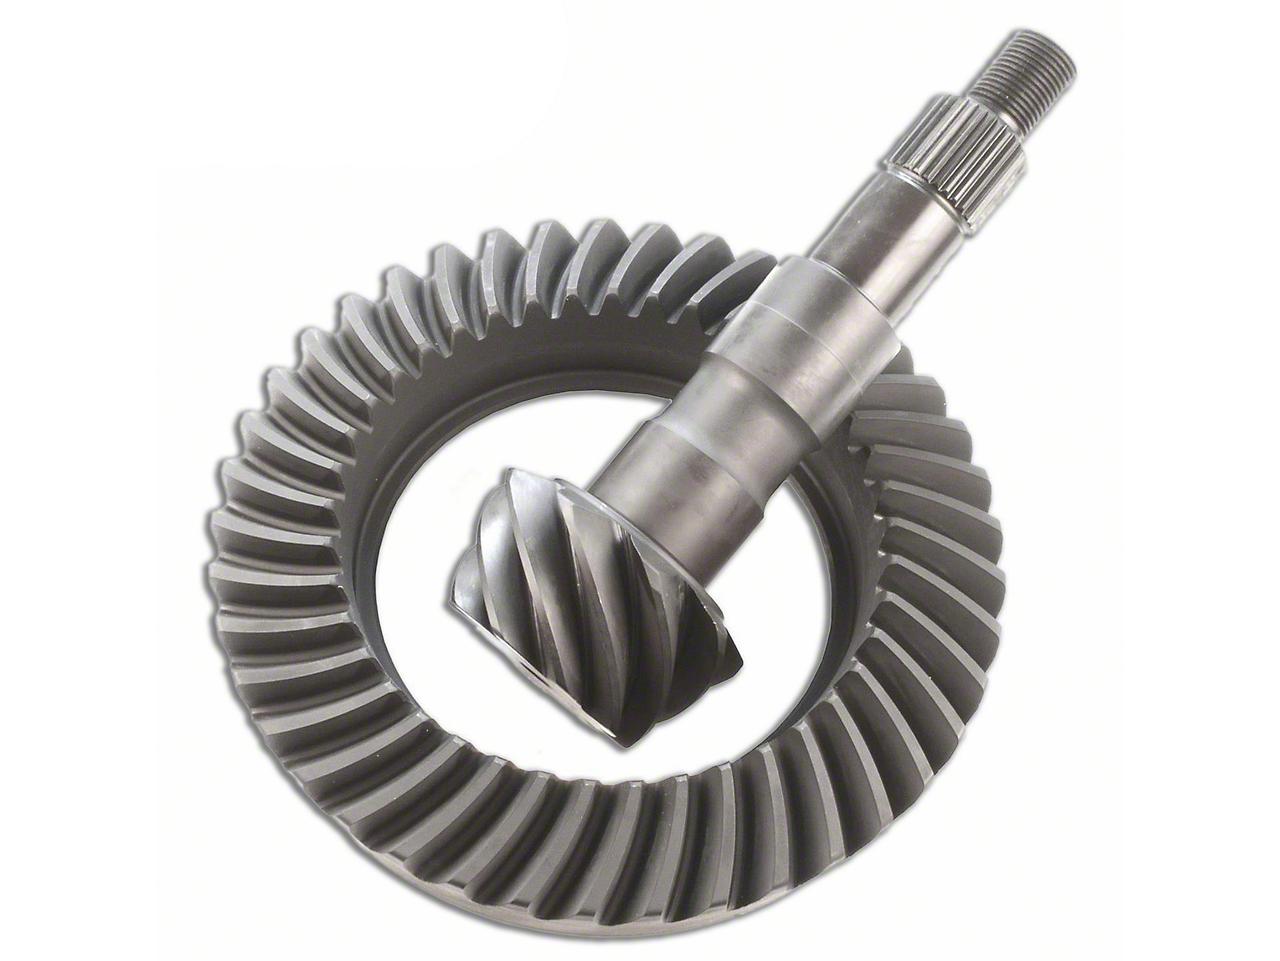 Motive Performance 8.5 in. & 8.6 in. Rear Ring Gear and Pinion Kit - 4.56 Gears (07-18 Silverado 1500)